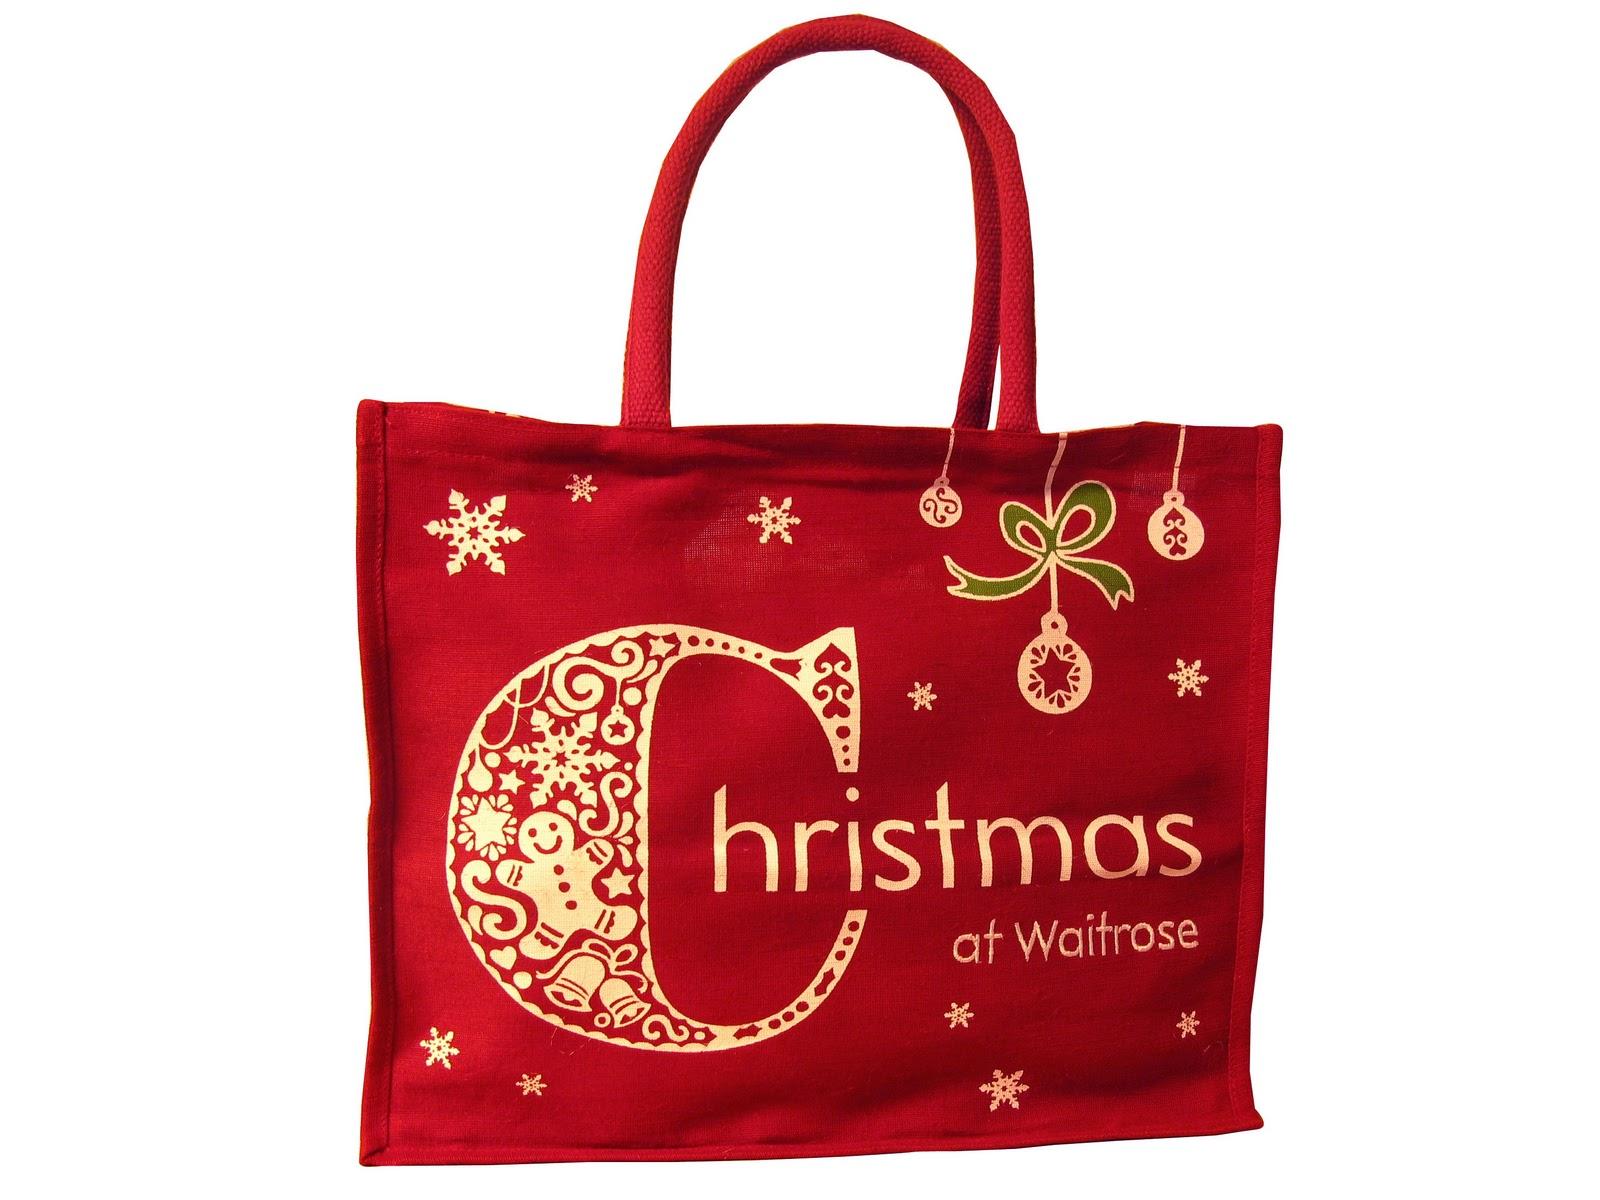 Waitrose new christmas bag and shopper